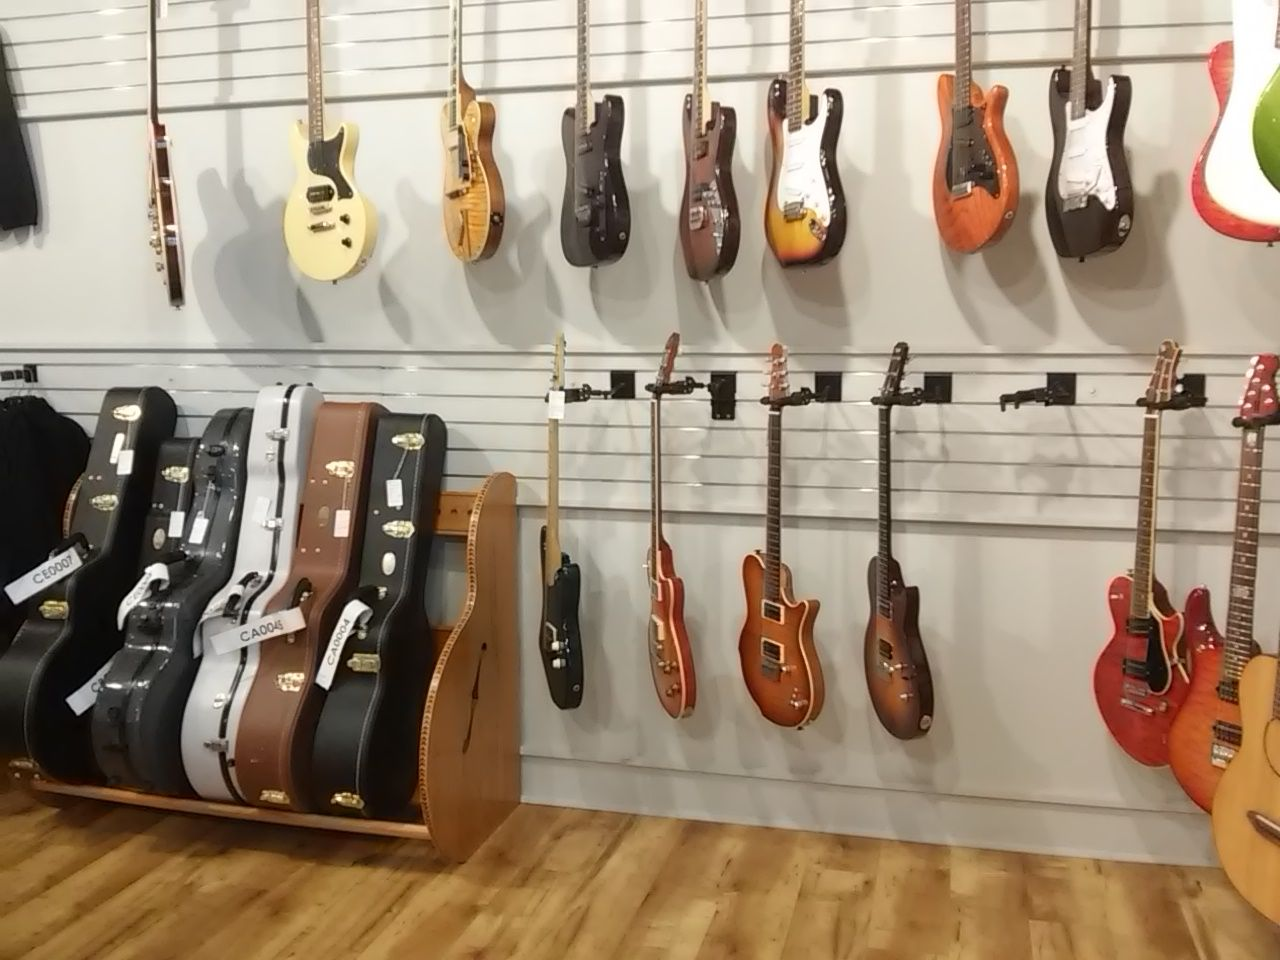 The Studio Guitar Case Storage Rack on display at Gruhn Guitars in Nashville, TN. View details at https://guitarstorage.com/guitar-case-storage-racks/